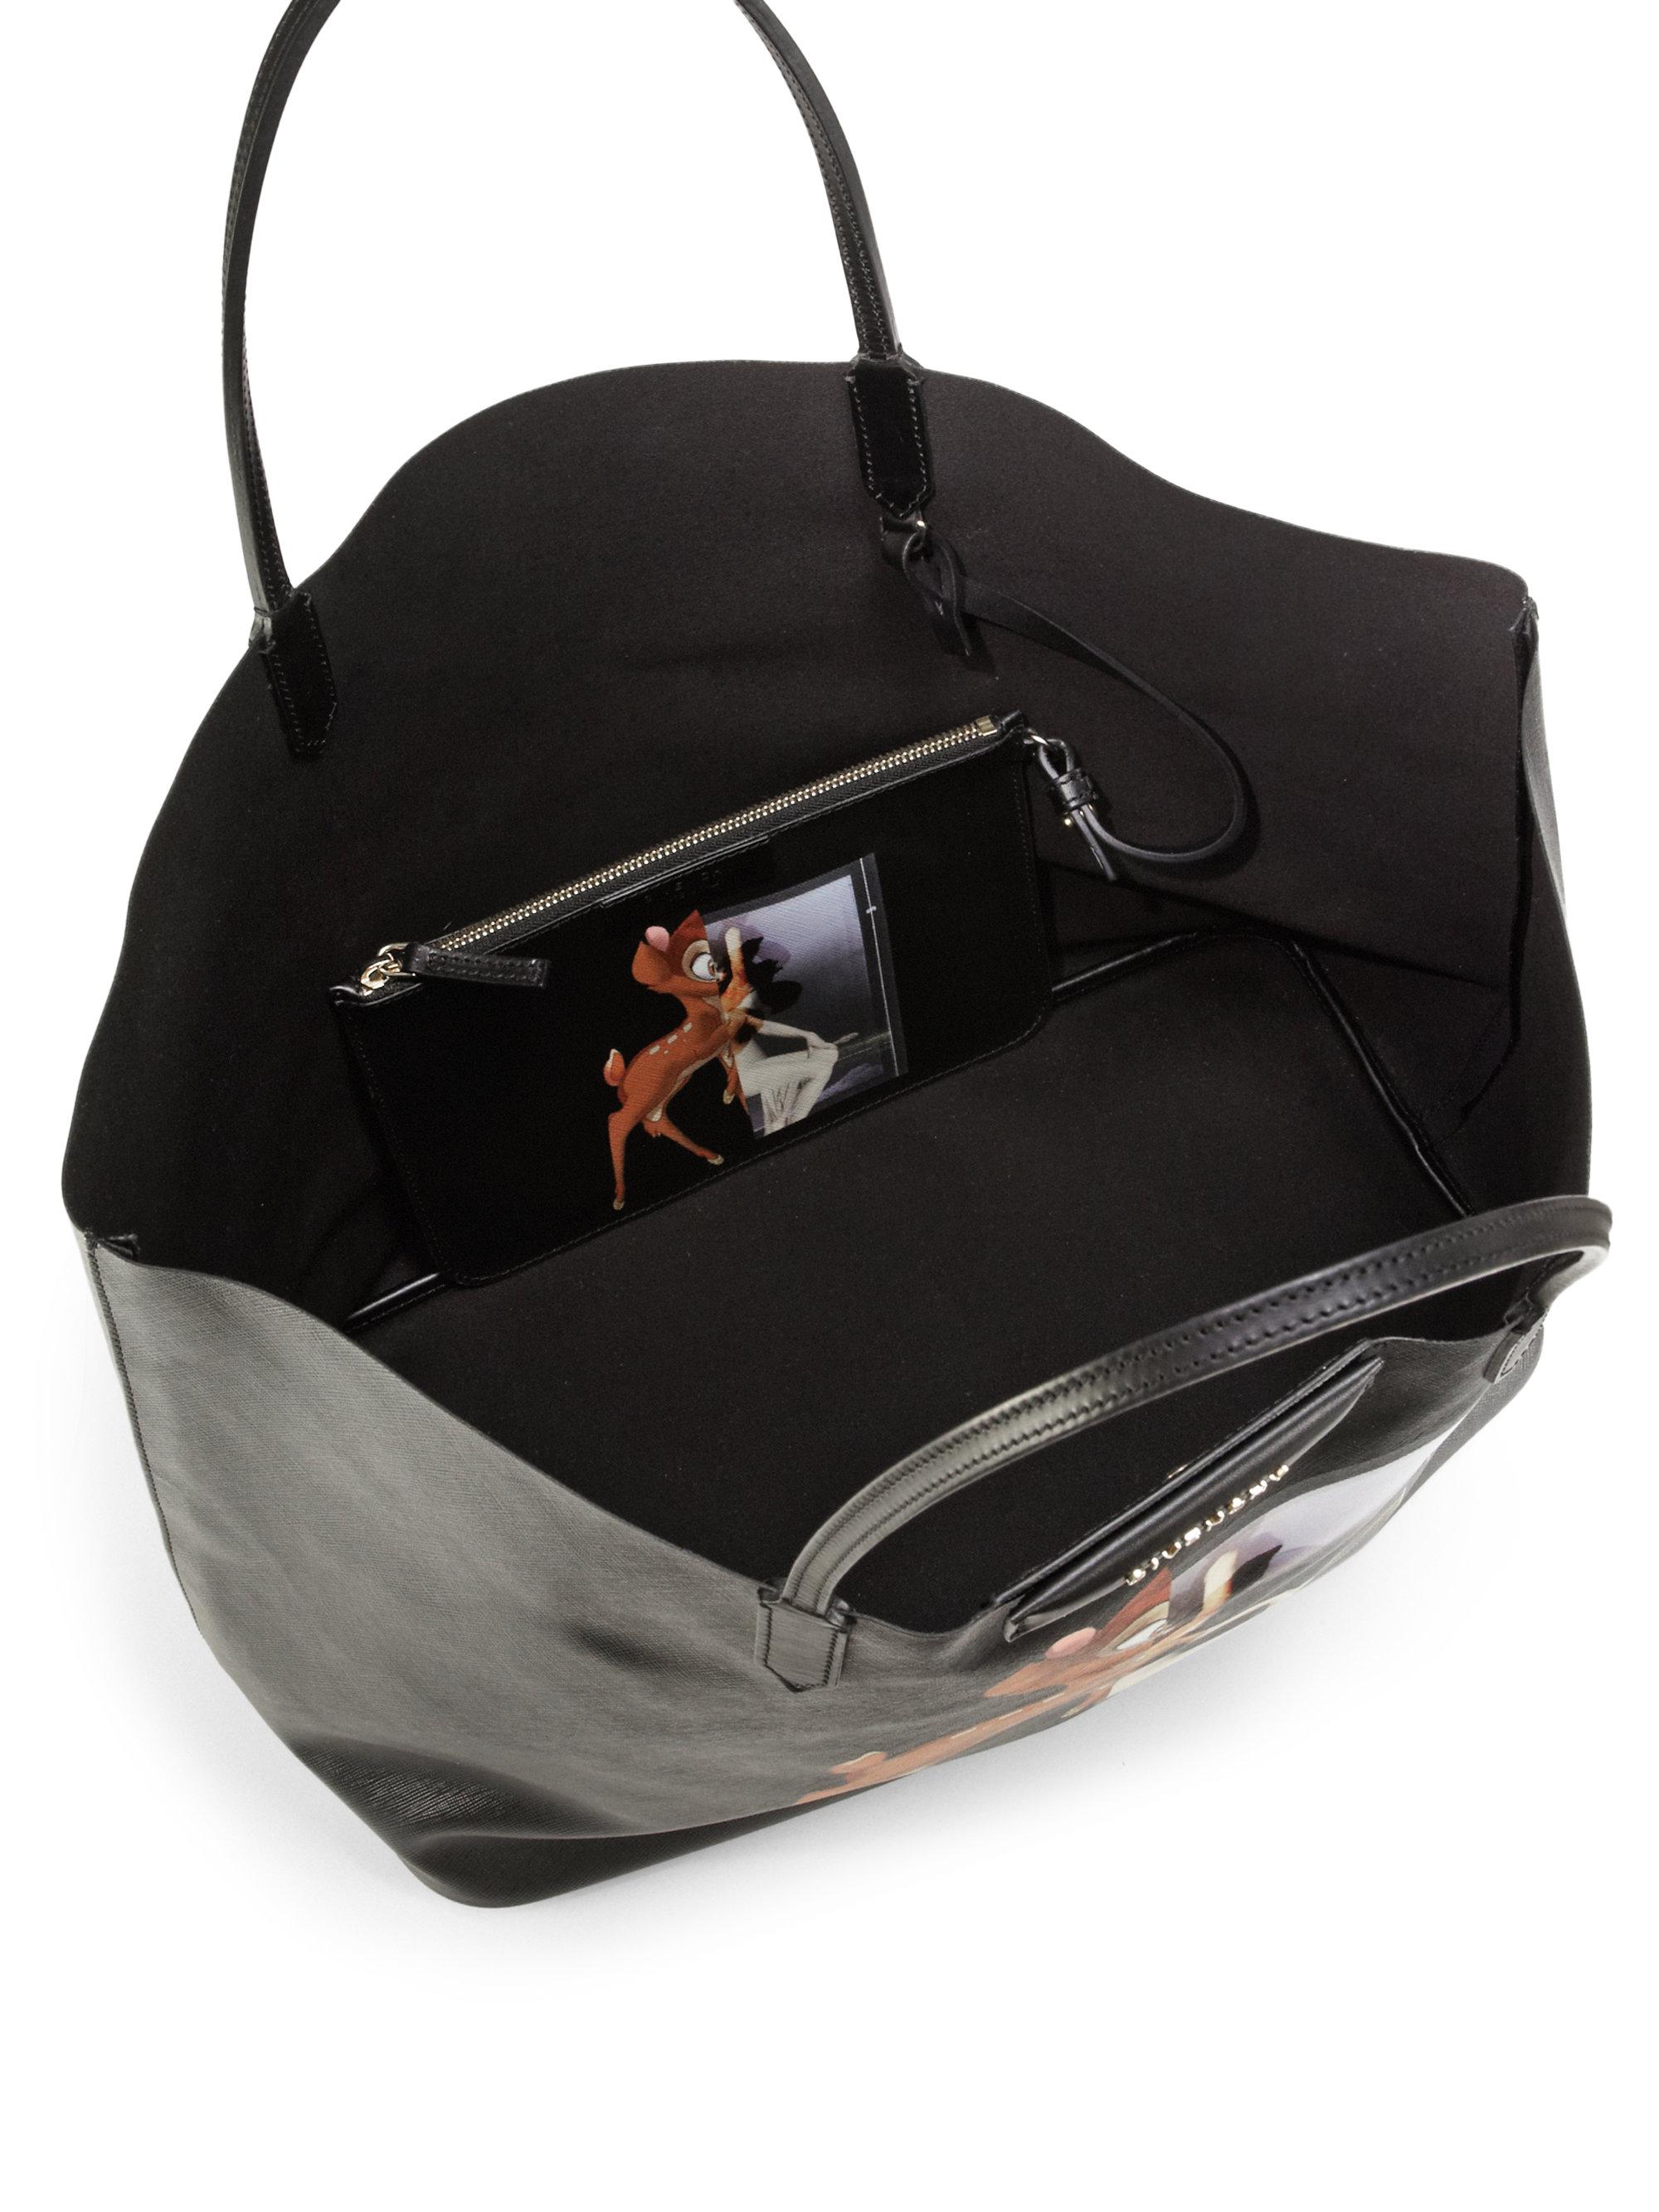 ... Lyst - Givenchy Bambi Medium Leather Shopper Tote in Black san  francisco fe8c1 5d1a0  Givenchy Antigona Large ... c0144ed79a